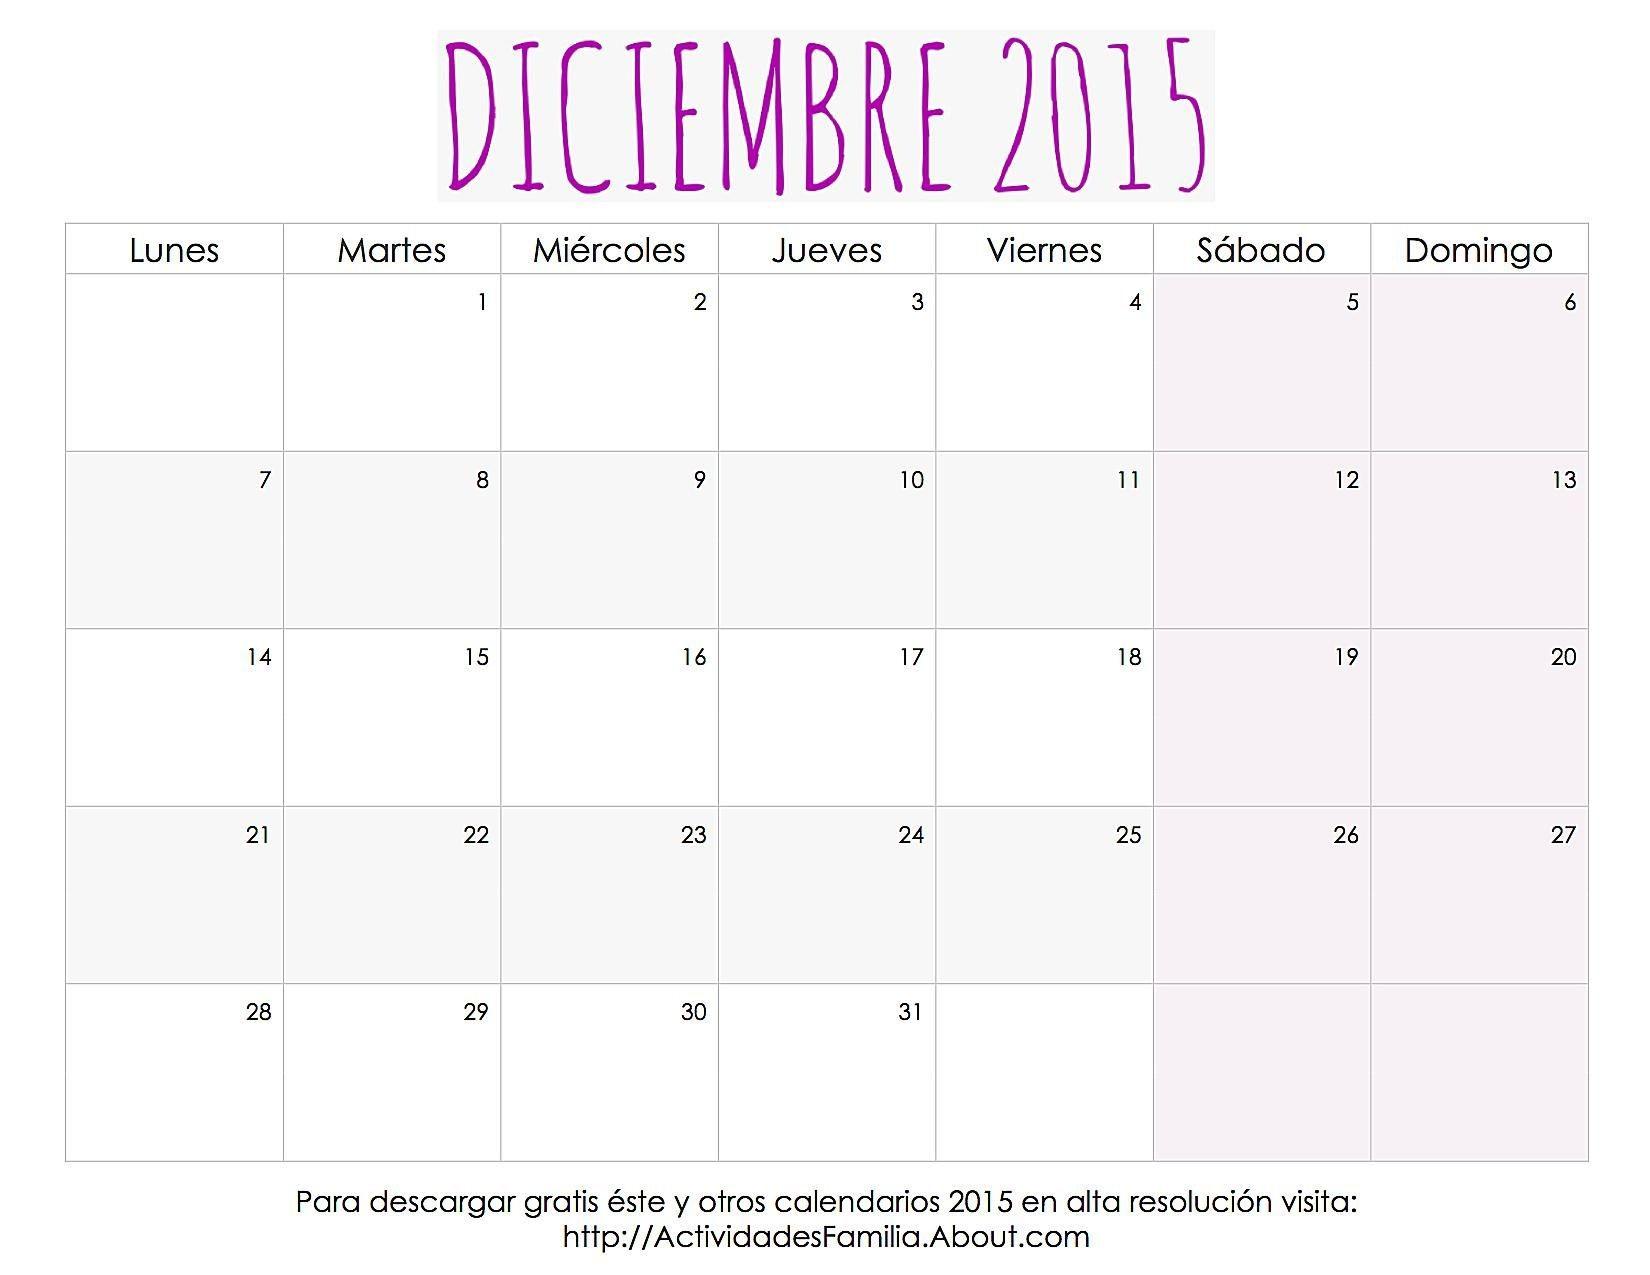 Calendaro Diciembre 2015 Rosa 597bac3b3df78cbb7a25b0bb